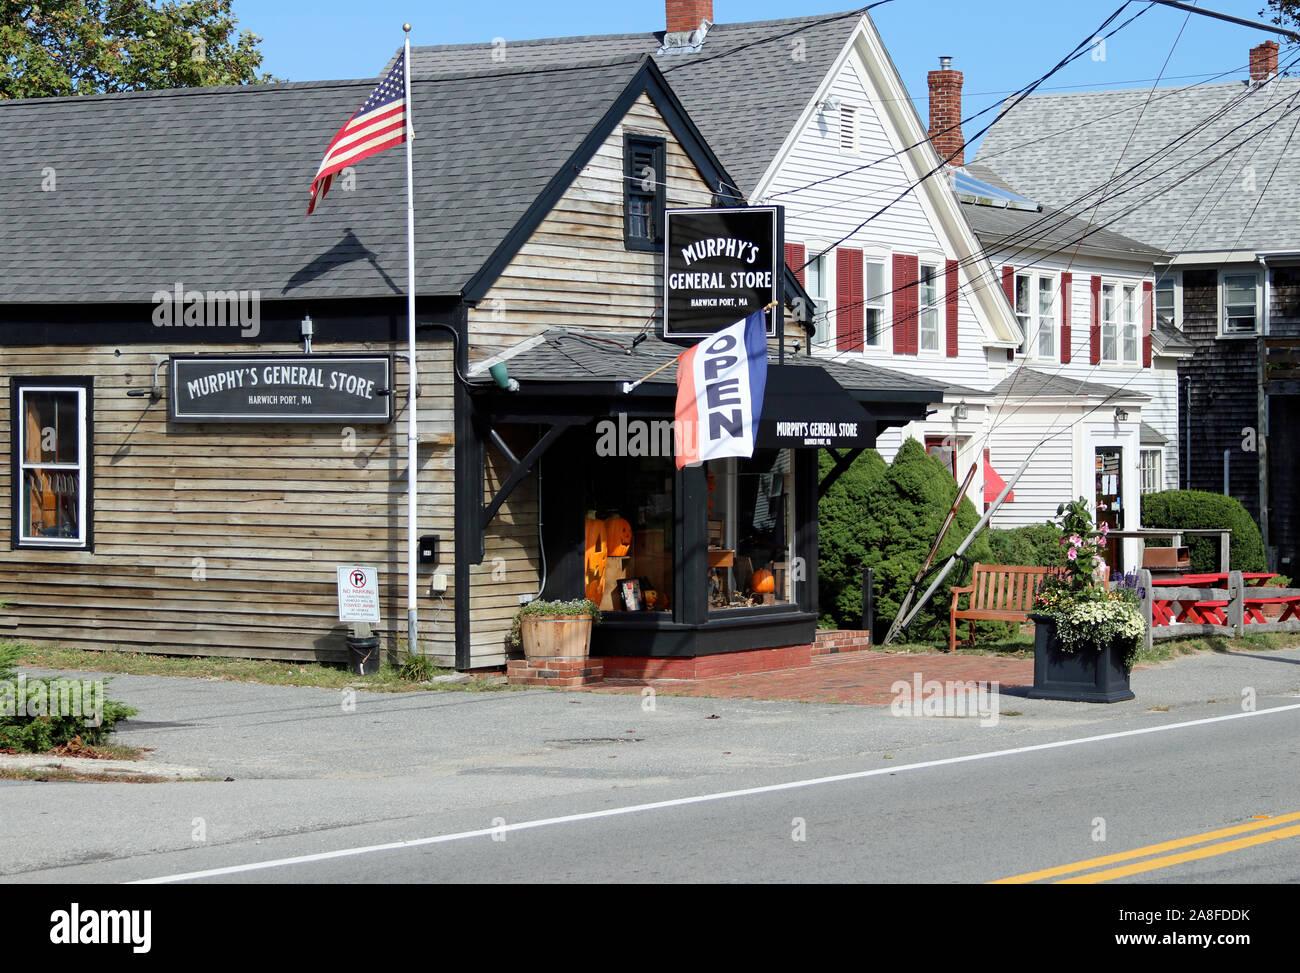 Murphy's General Store in Harwich Port, Massachusetts, on Cape Cod Stock Photo